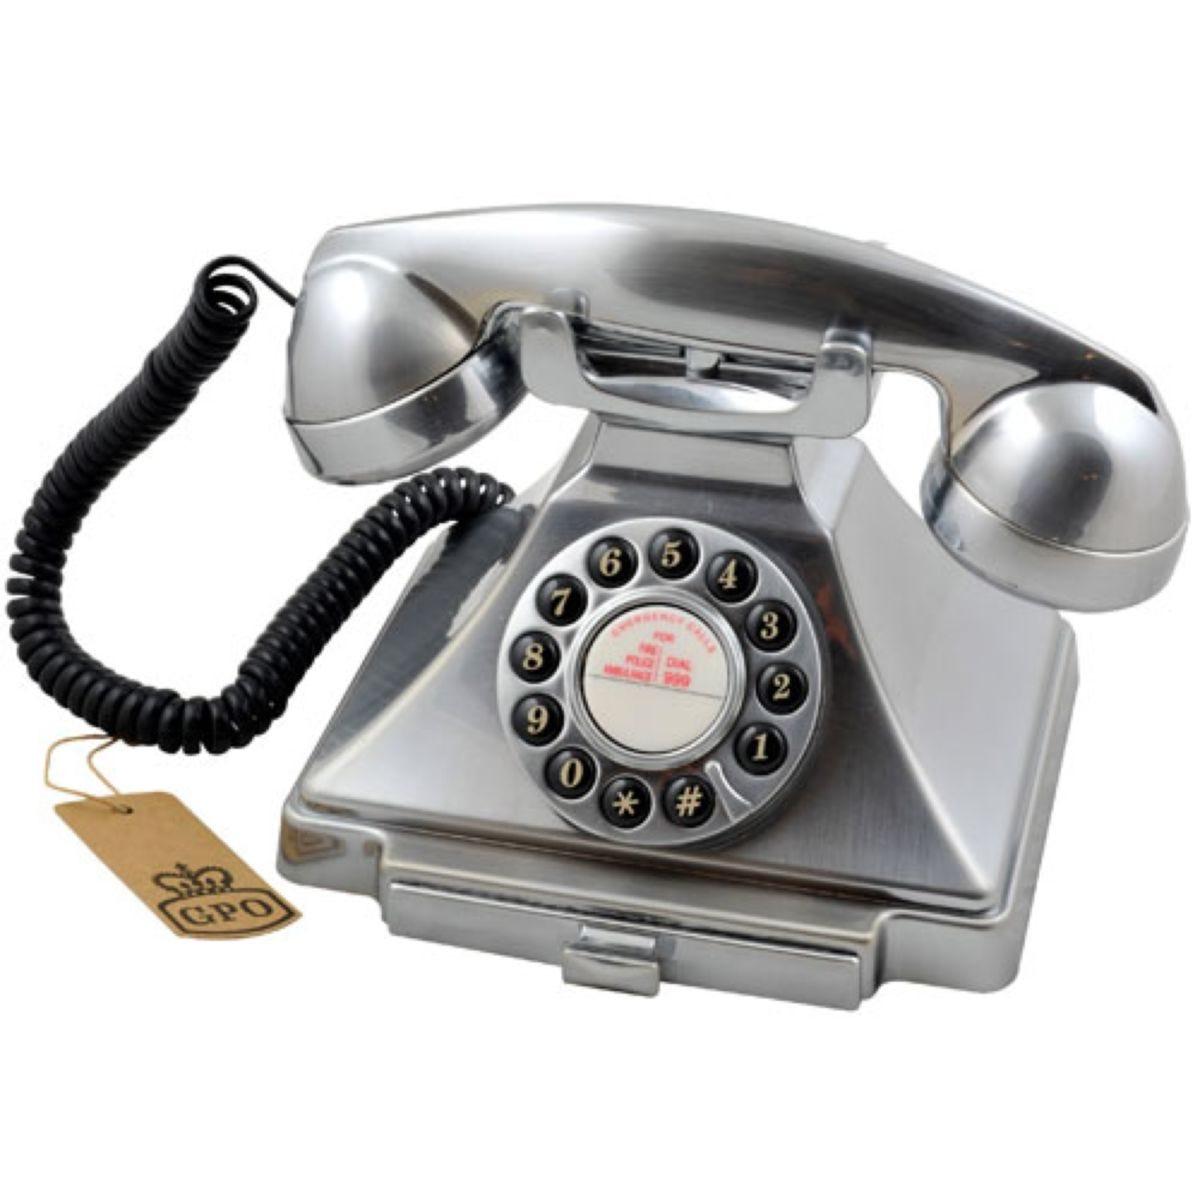 GPO Carrington Nostalgic Design Telephone - Chrome